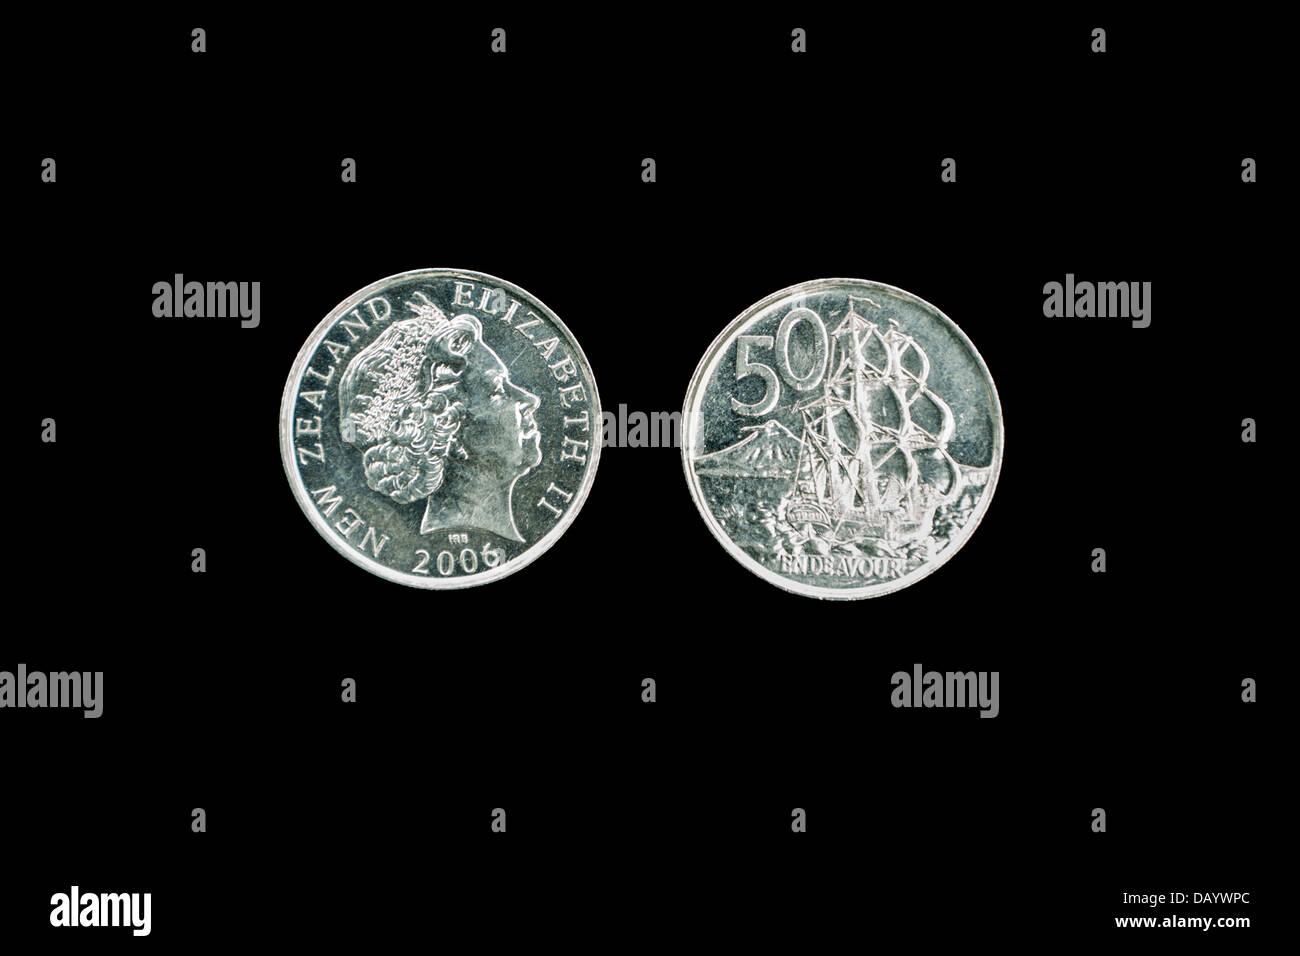 New Zealand Münzen 50 Cent Stück Halb Dollar Königin Elizabeth